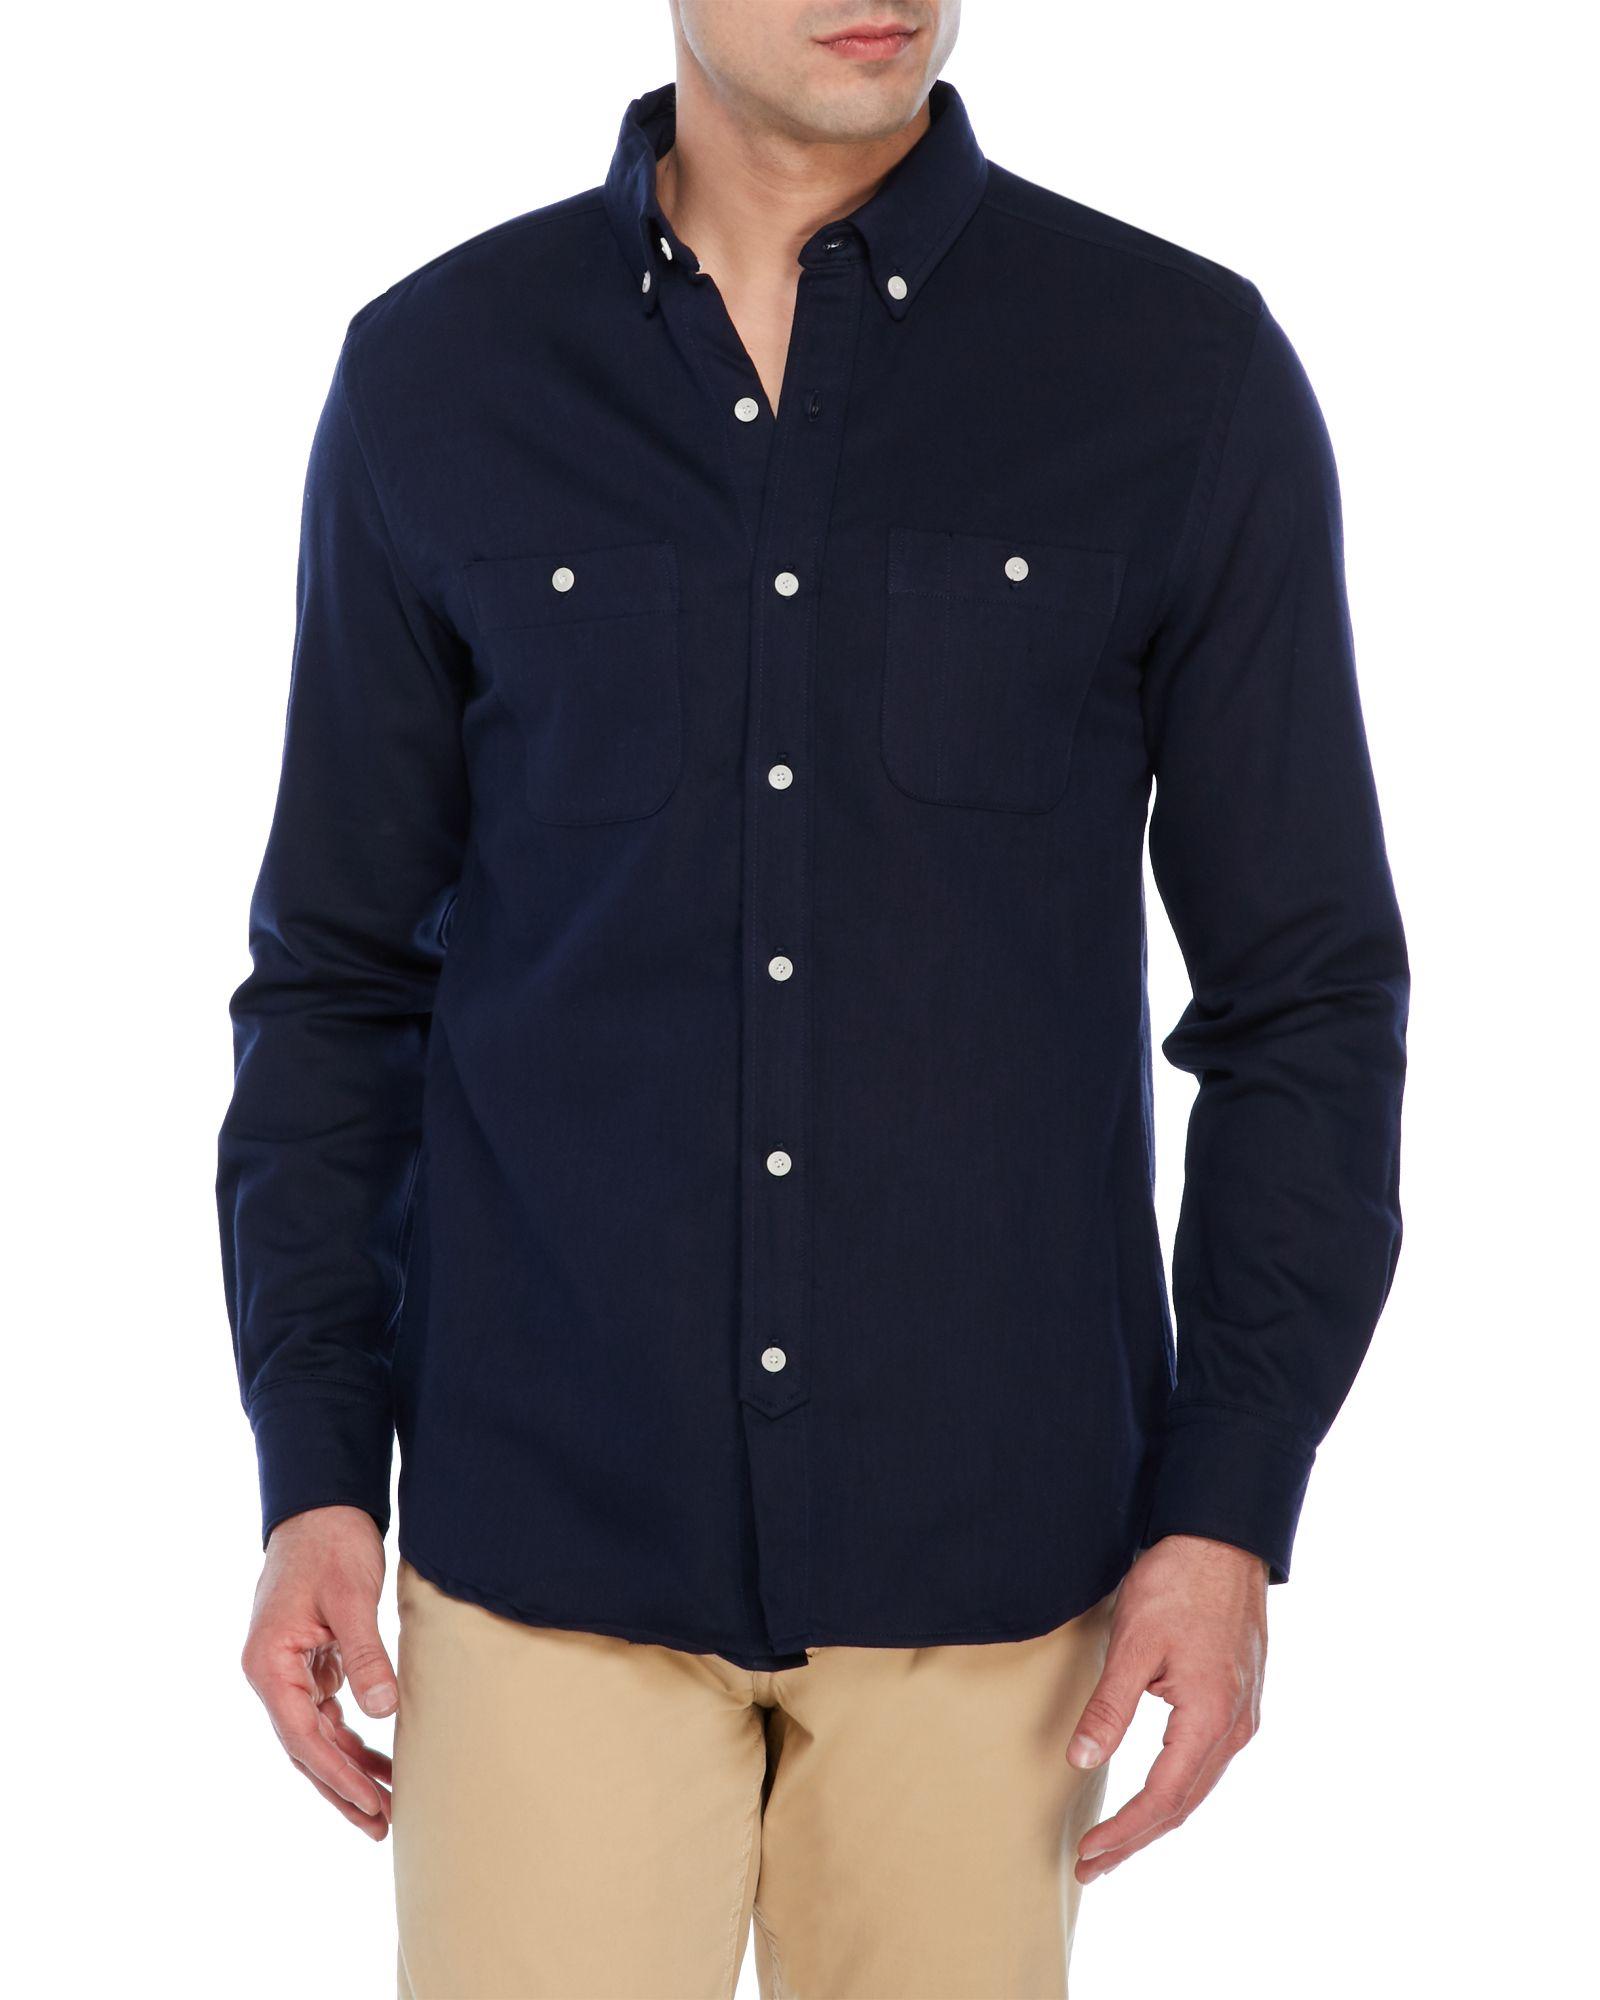 Haspel mohawk buttondown shirt apparel u accessories